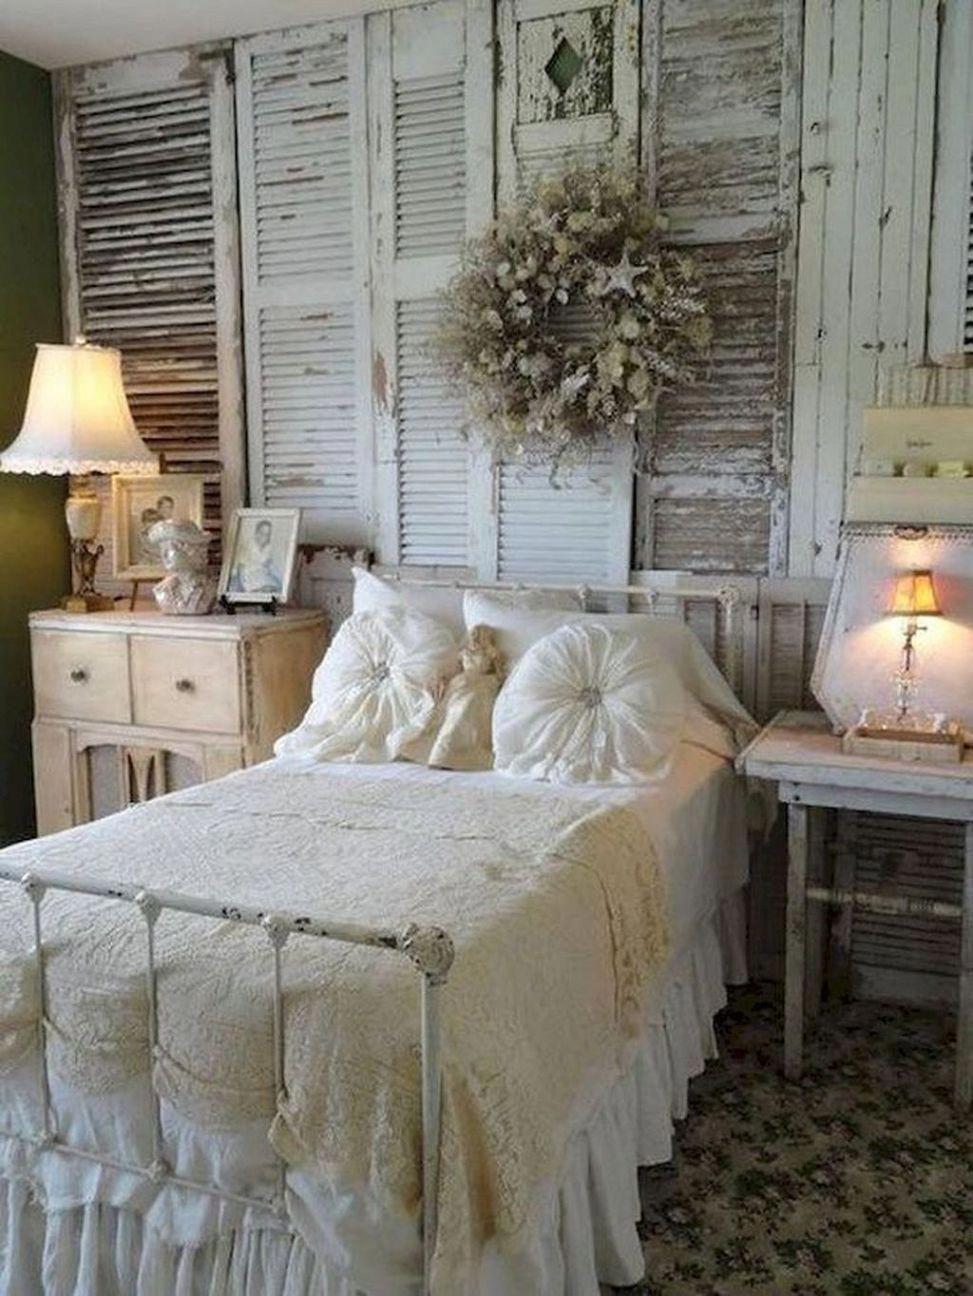 shabby chic bedroom sets for sale shabby chic garden furniture rh pinterest com Shabby Chic Bedroom Furniture Sets Shabby Chic Bedroom Furniture Sets